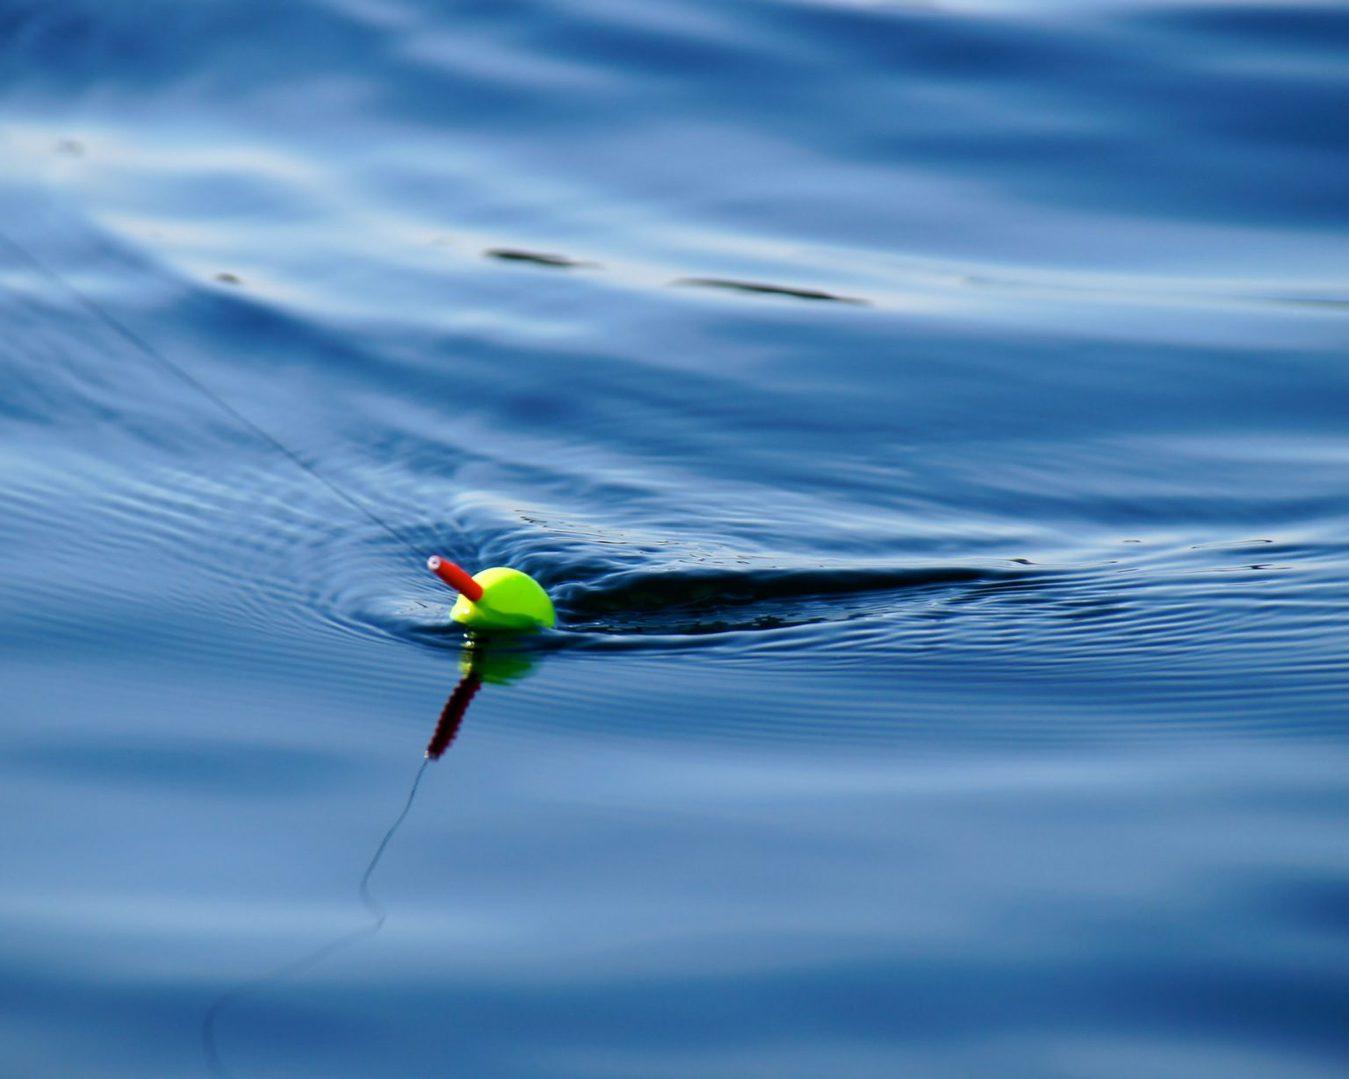 Fishing lure in water, closeup